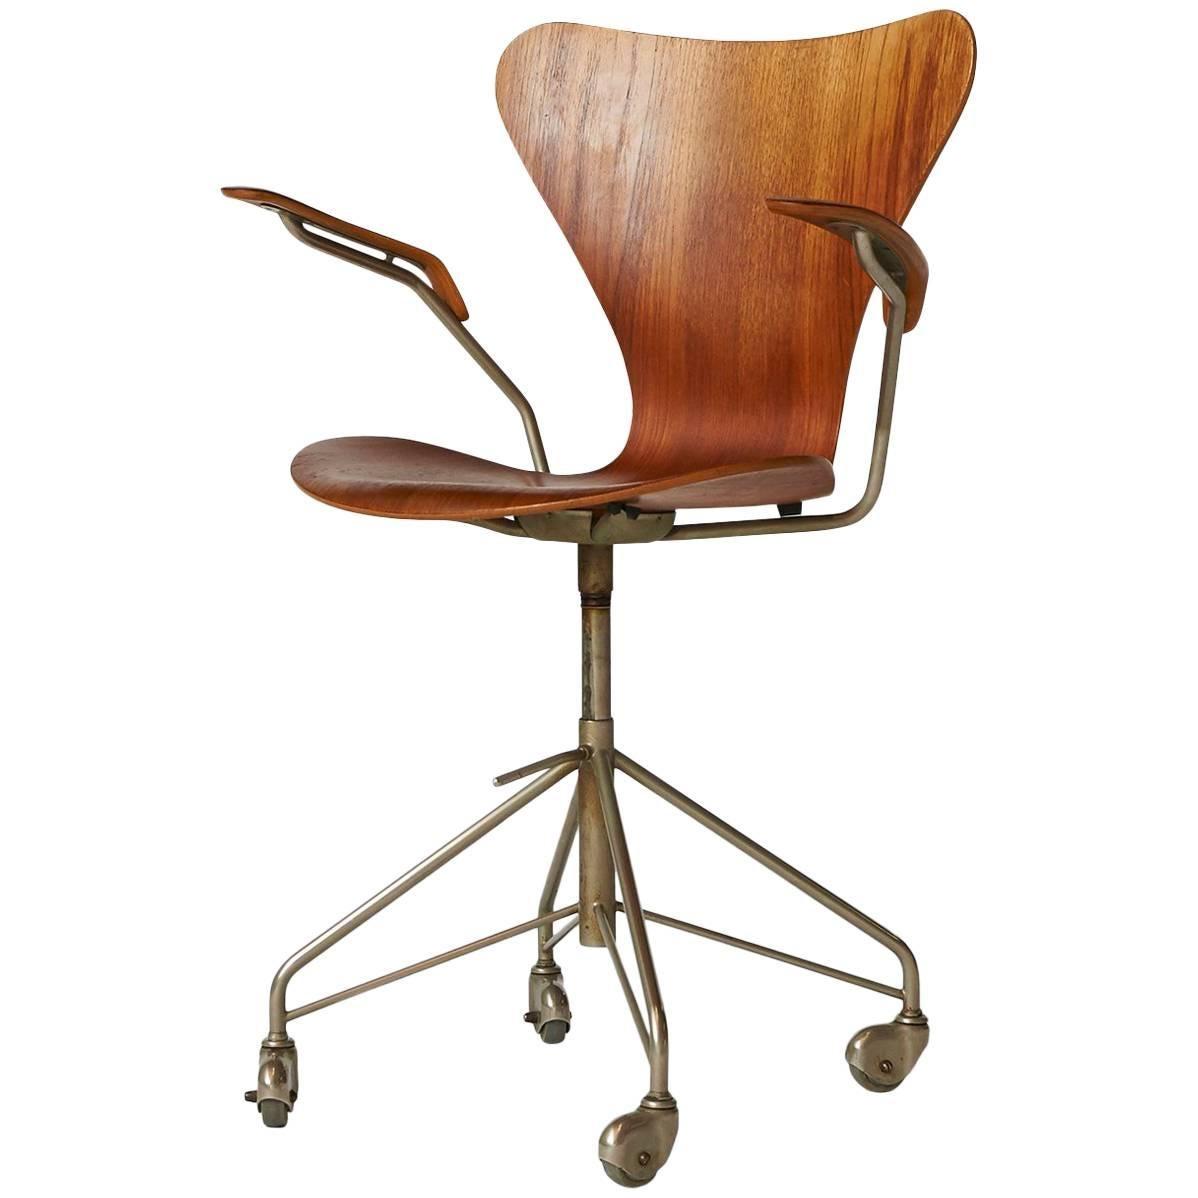 Arne Jacobsen, Series 7 Office Chair, Model 3217